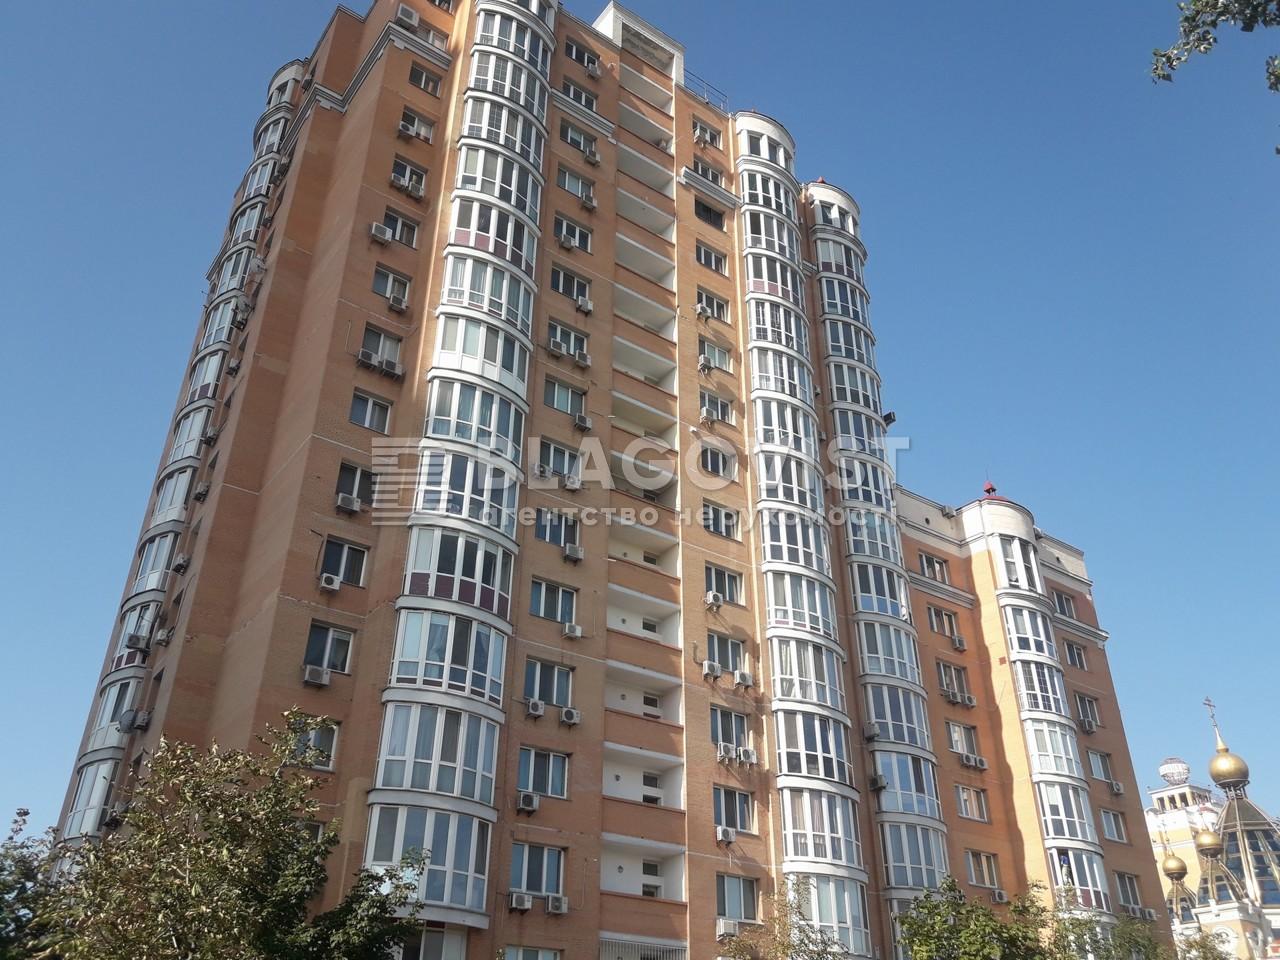 Квартира H-48289, Героїв Сталінграду просп., 4 корпус 6, Київ - Фото 6